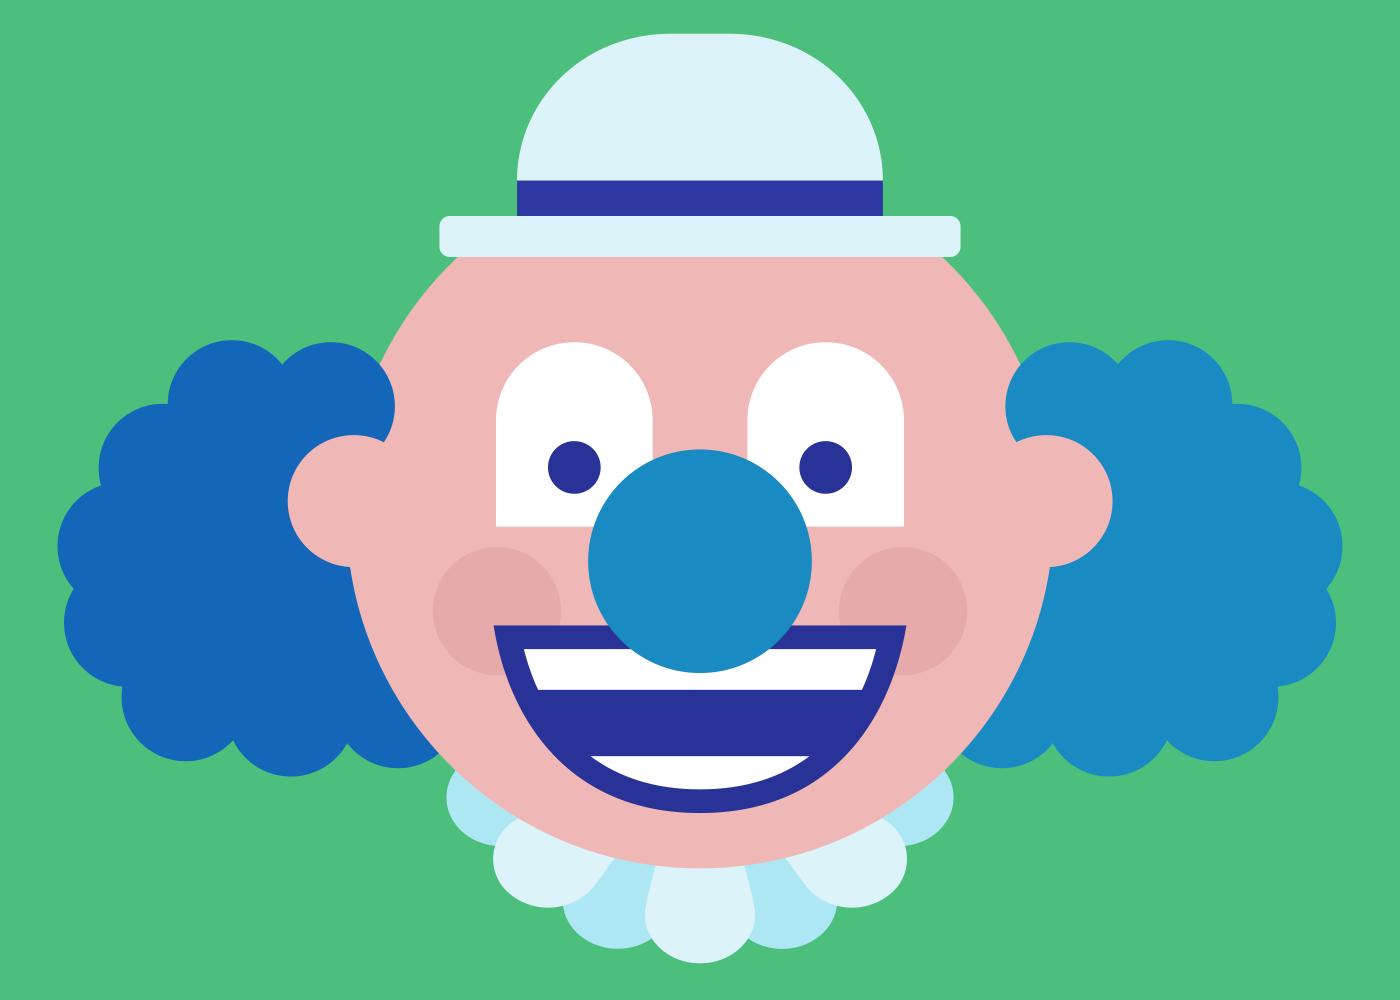 An illustration of a clown.